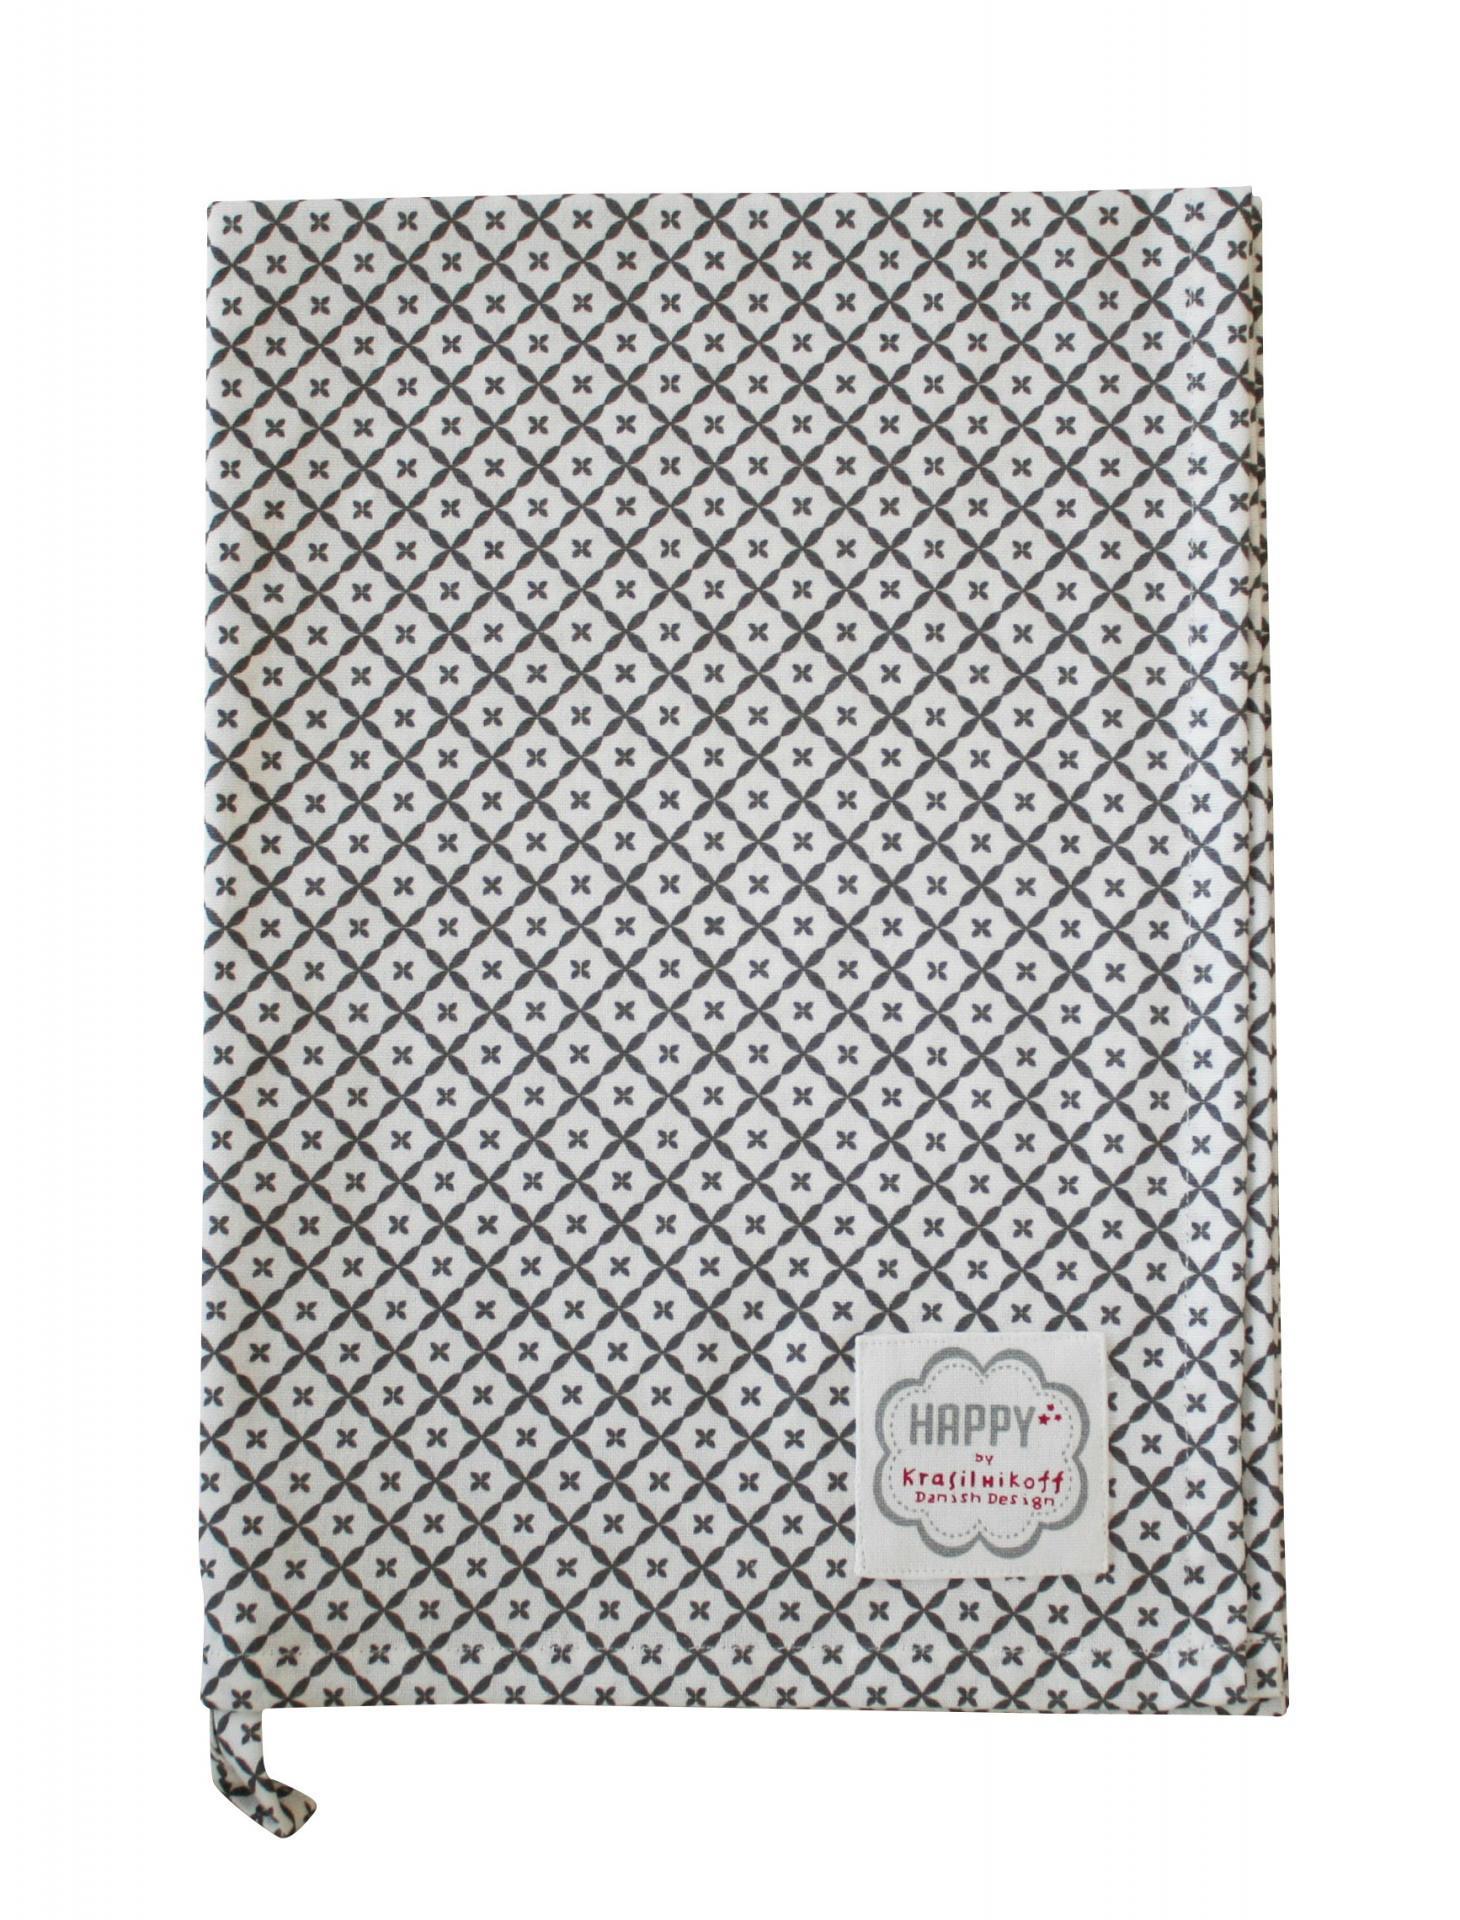 Krasilnikoff Utěrka Charcoal diagonal, šedá barva, textil